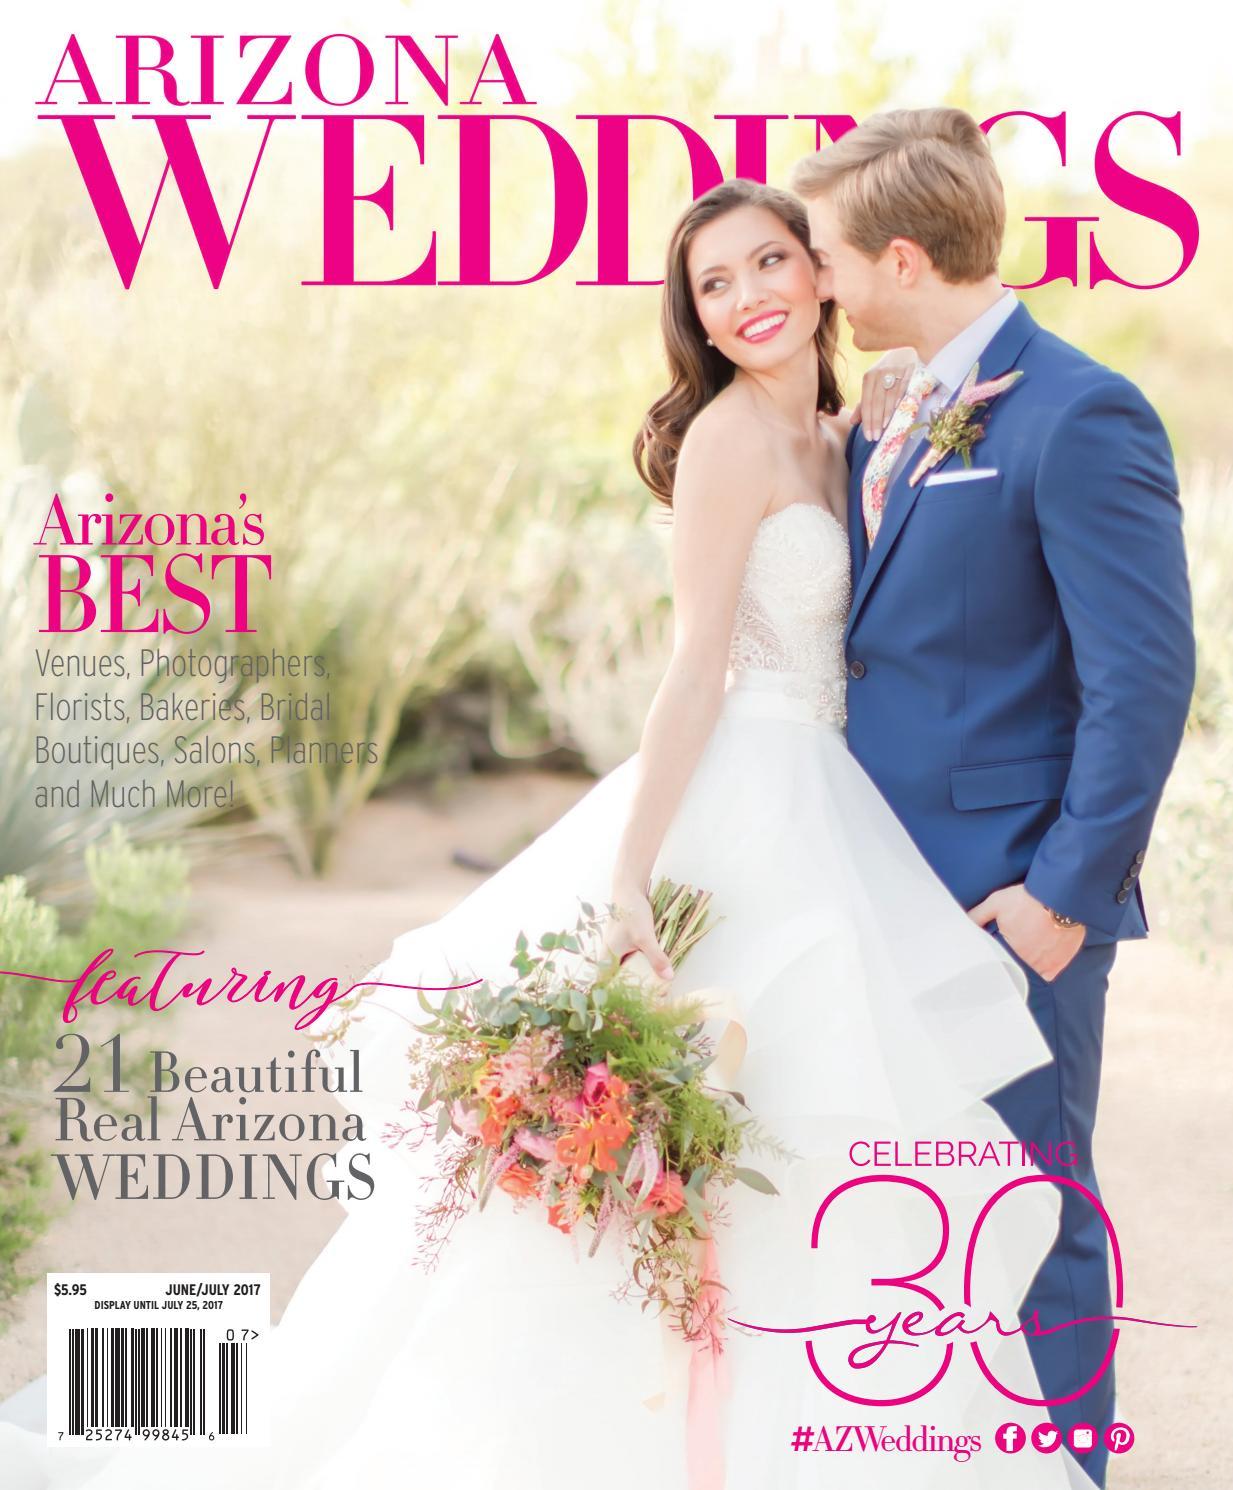 2ca282d87788 Arizona Weddings Magazine June/July 2017 by Arizona Weddings Magazine &  Website - issuu